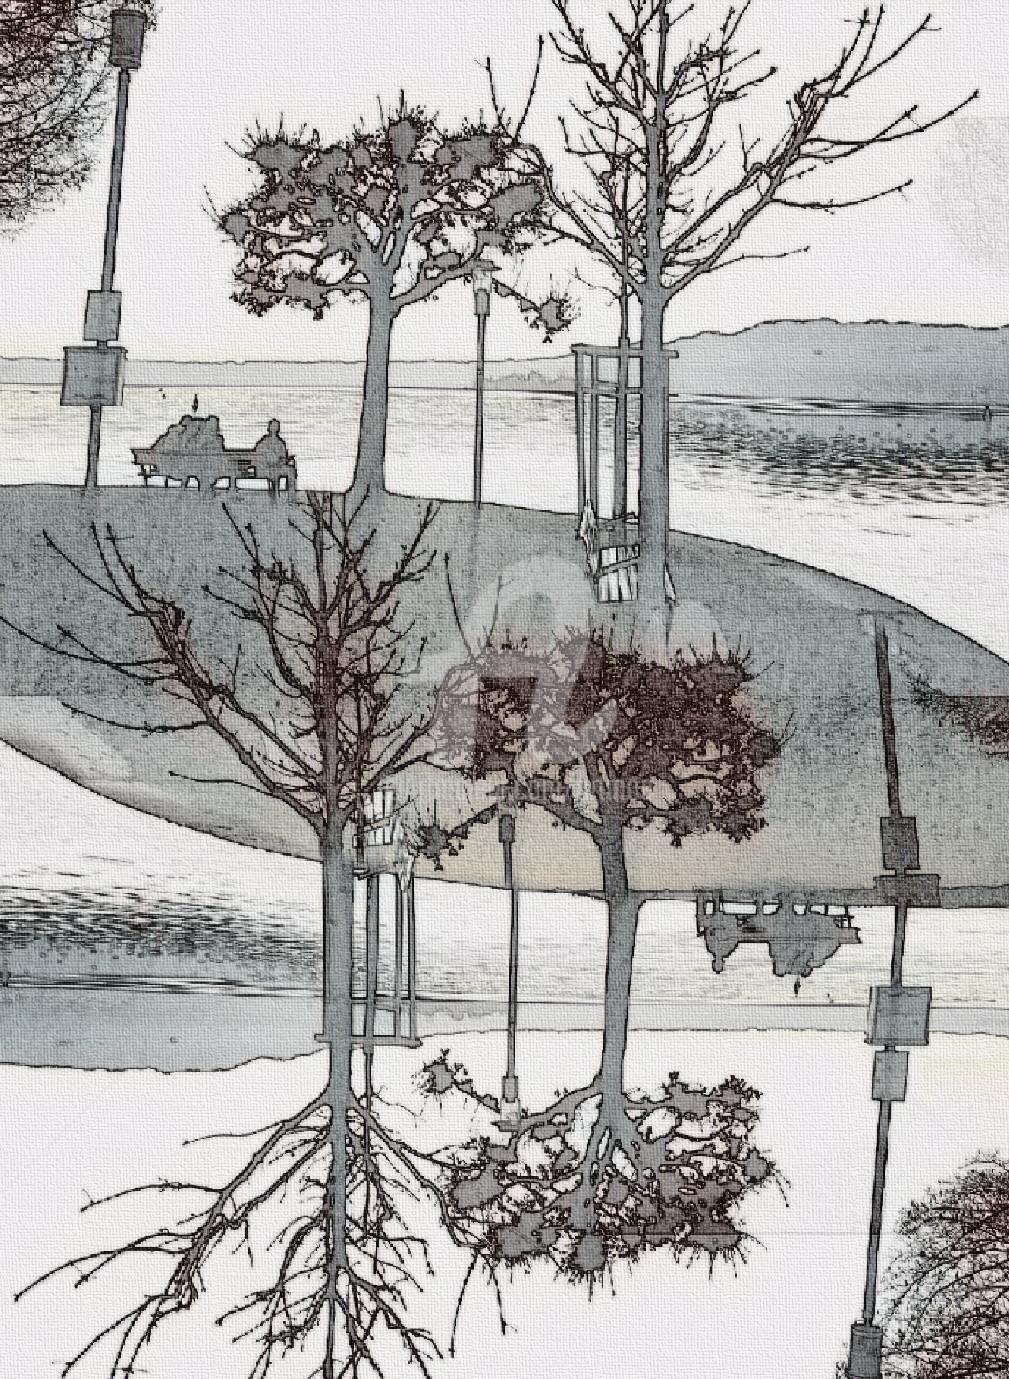 Art Moé - The Lake